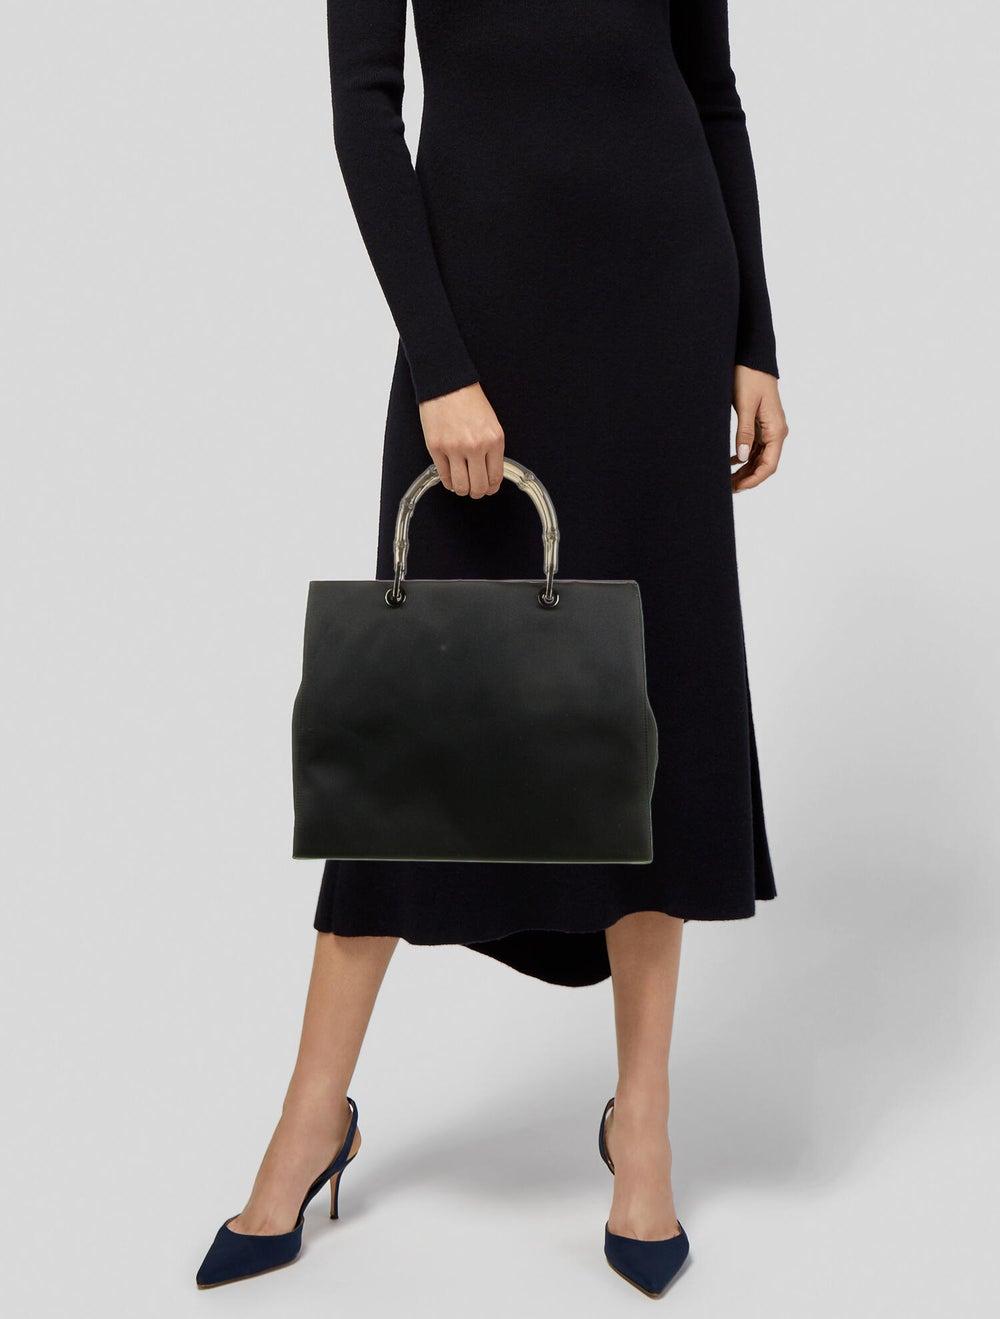 Gucci Clear Bamboo Satin Diana Handle Bag Black - image 2